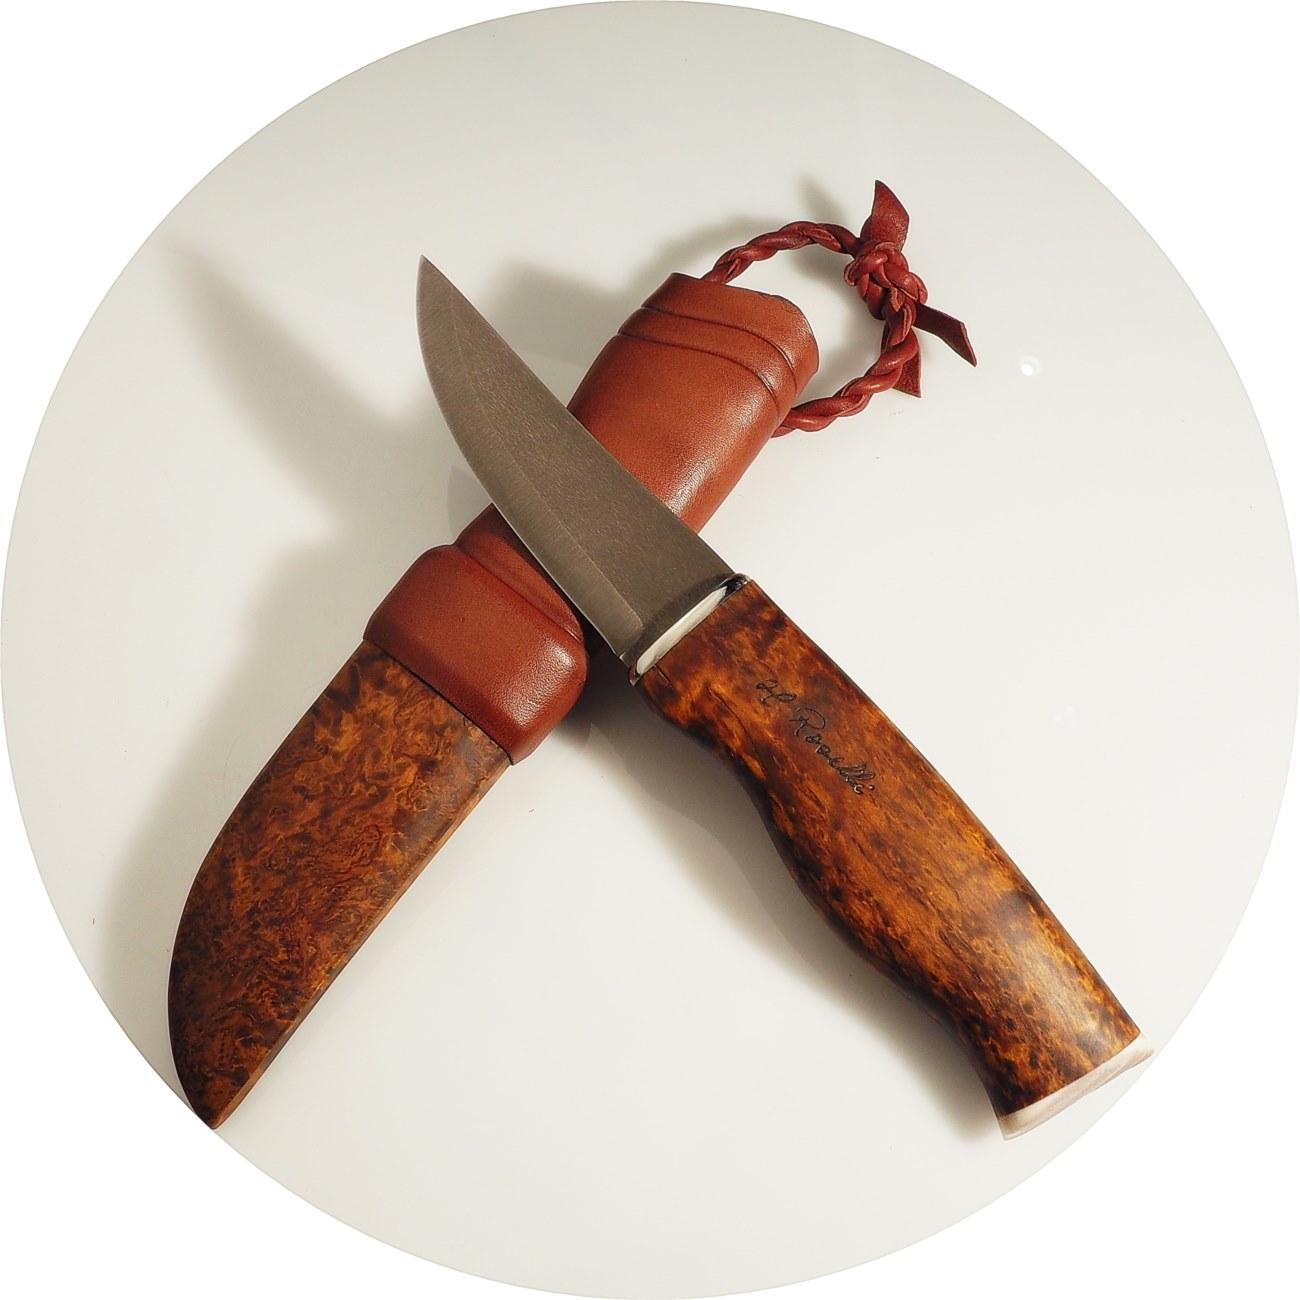 Roselli couteau chasseur NALLE acier Wootz